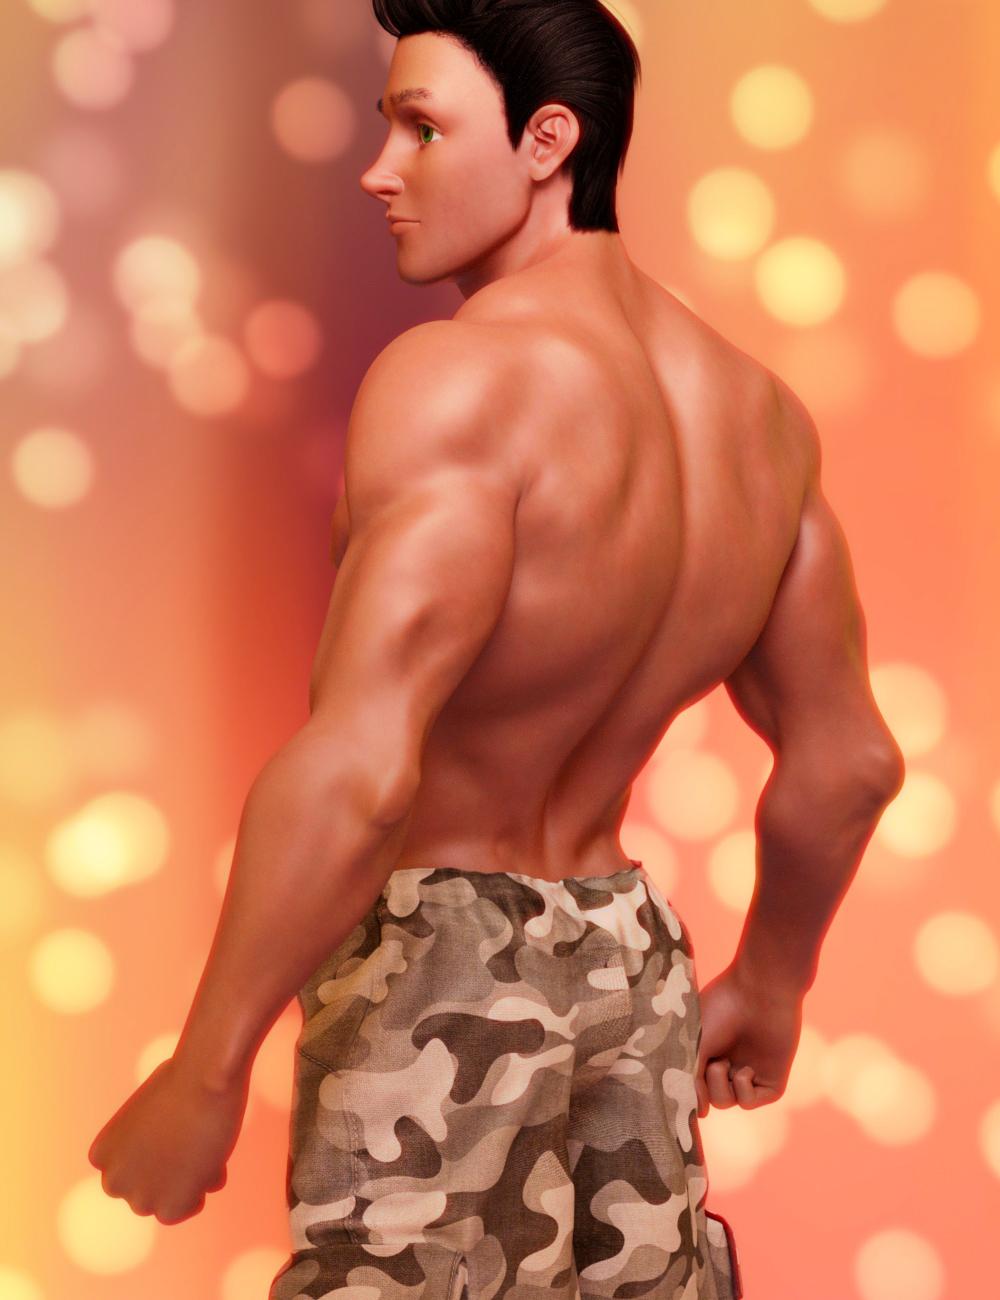 Toon Hero for Genesis 8 Male by: JoeQuick, 3D Models by Daz 3D